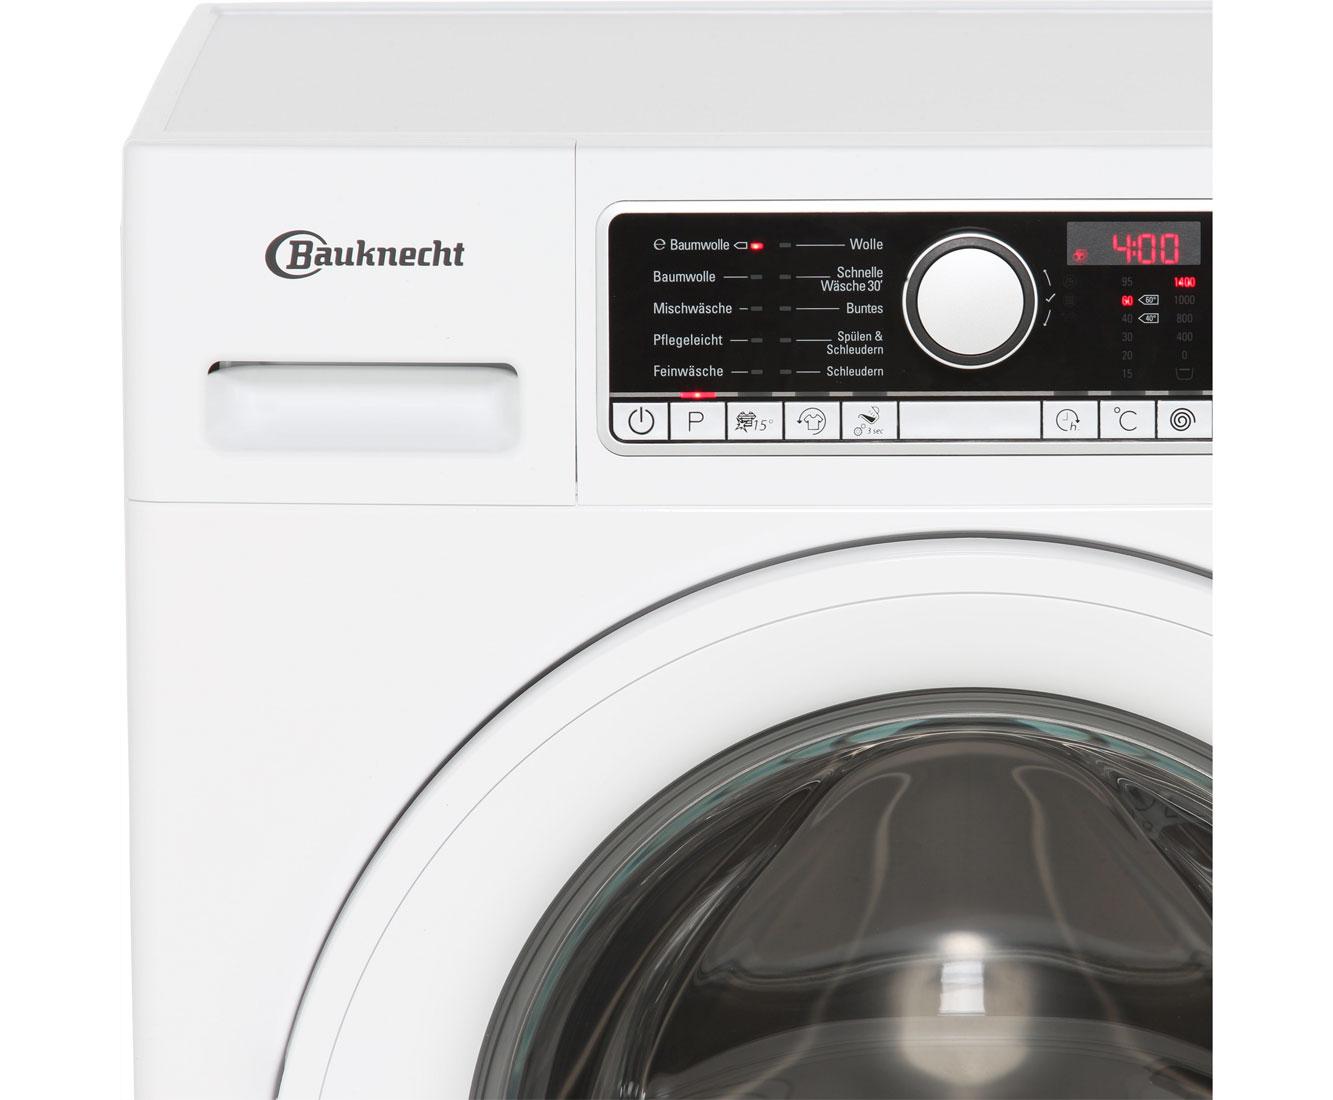 Bauknecht premiumcare wa prime pm waschmaschine kg u